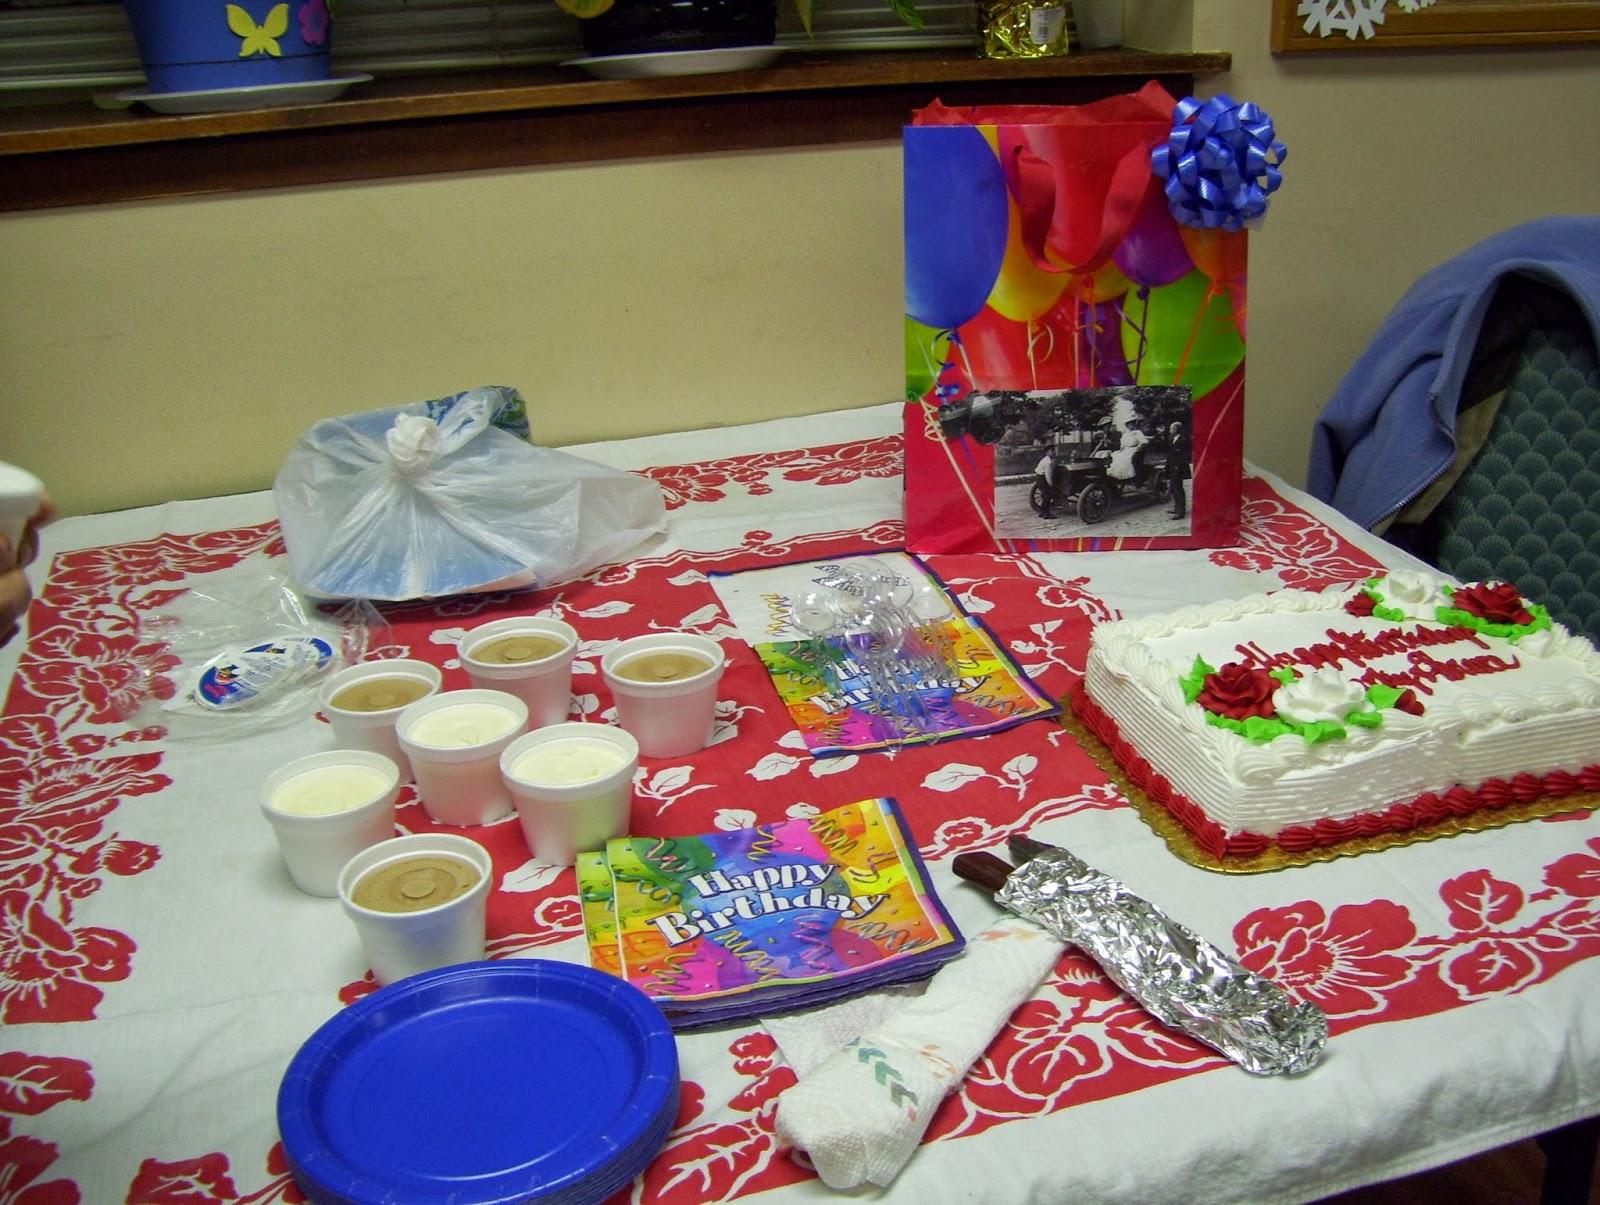 Cake Art In Elizabethton Tn : The Art of Positive Living: A Birthday Celebration in East ...